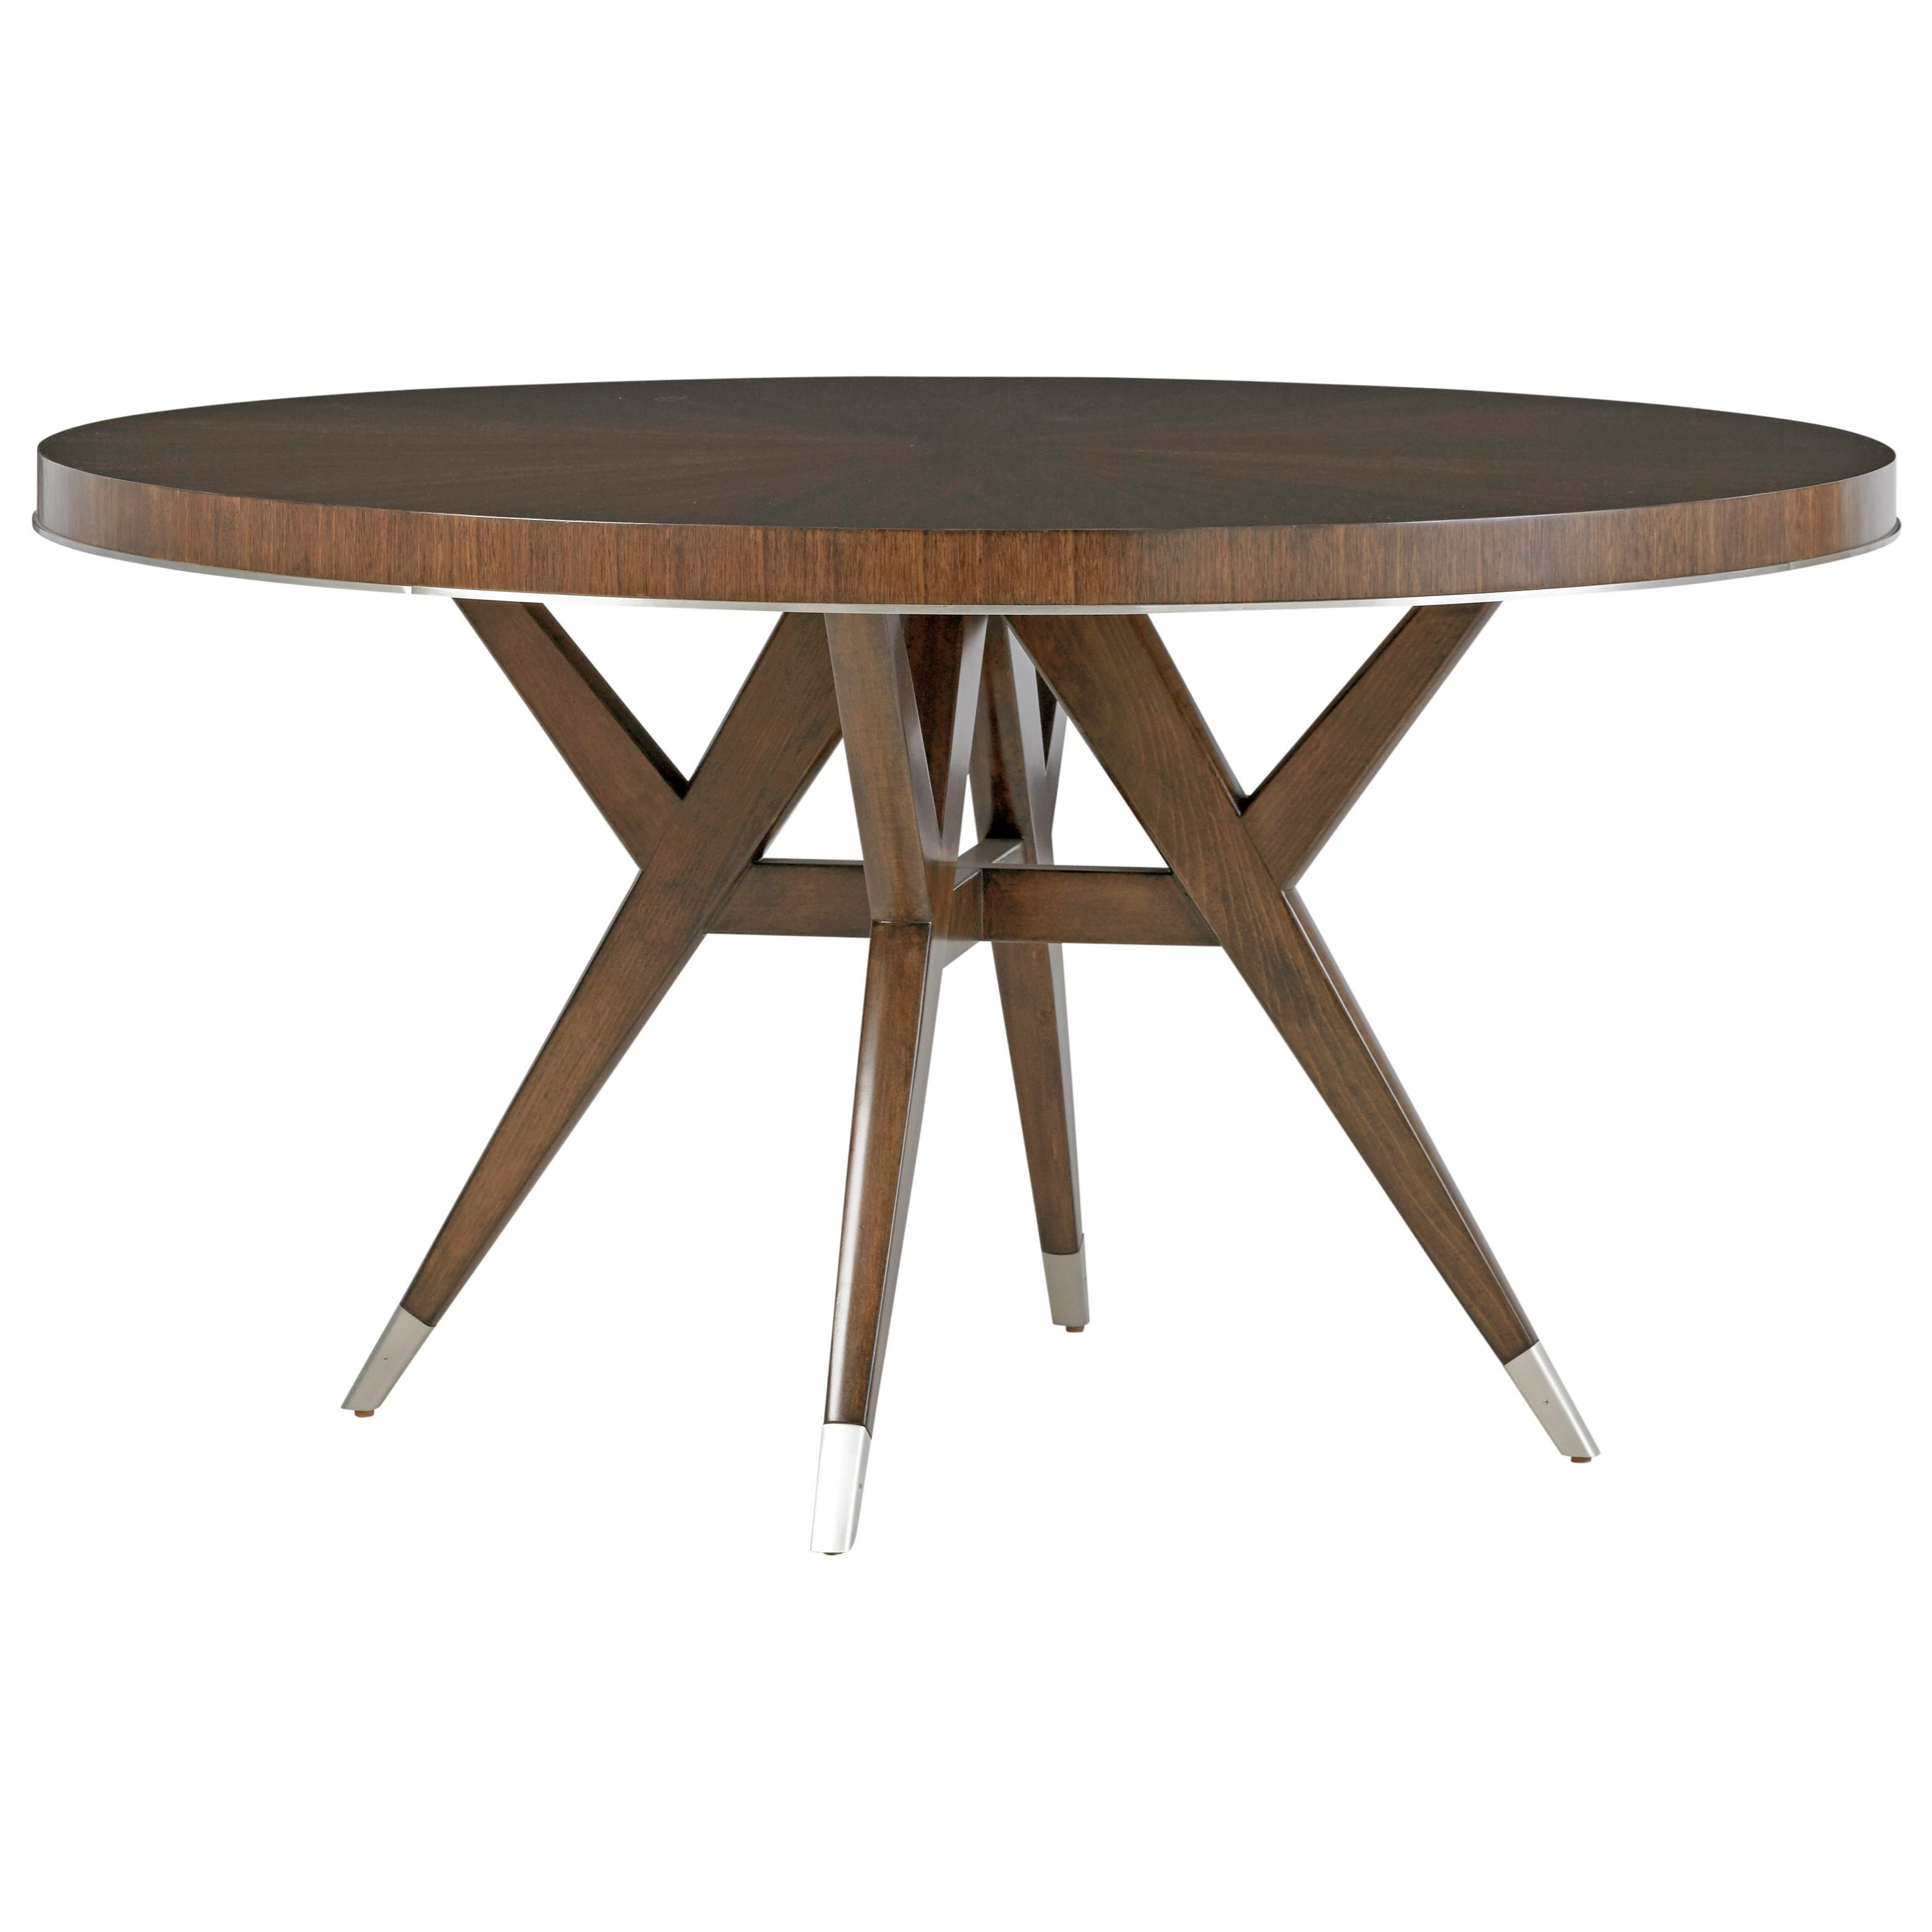 Lexington MacArthur Park Villa Grove Dining Table - Item Number: 729-870C